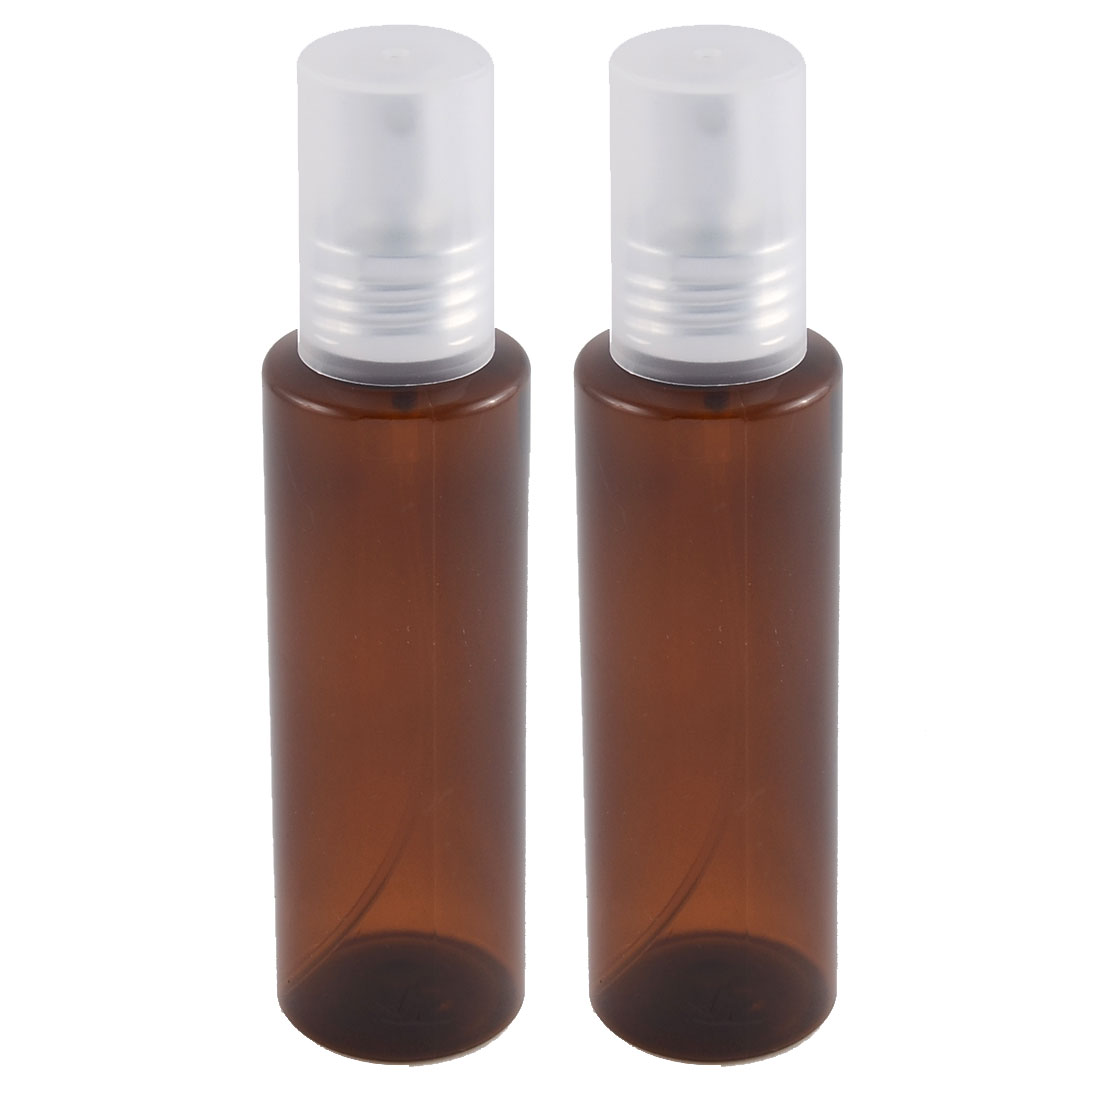 Traveling Plastic Shampoo Cosmetic Emulsion Press Pump Spray Bottle Brown 100ml 2pcs